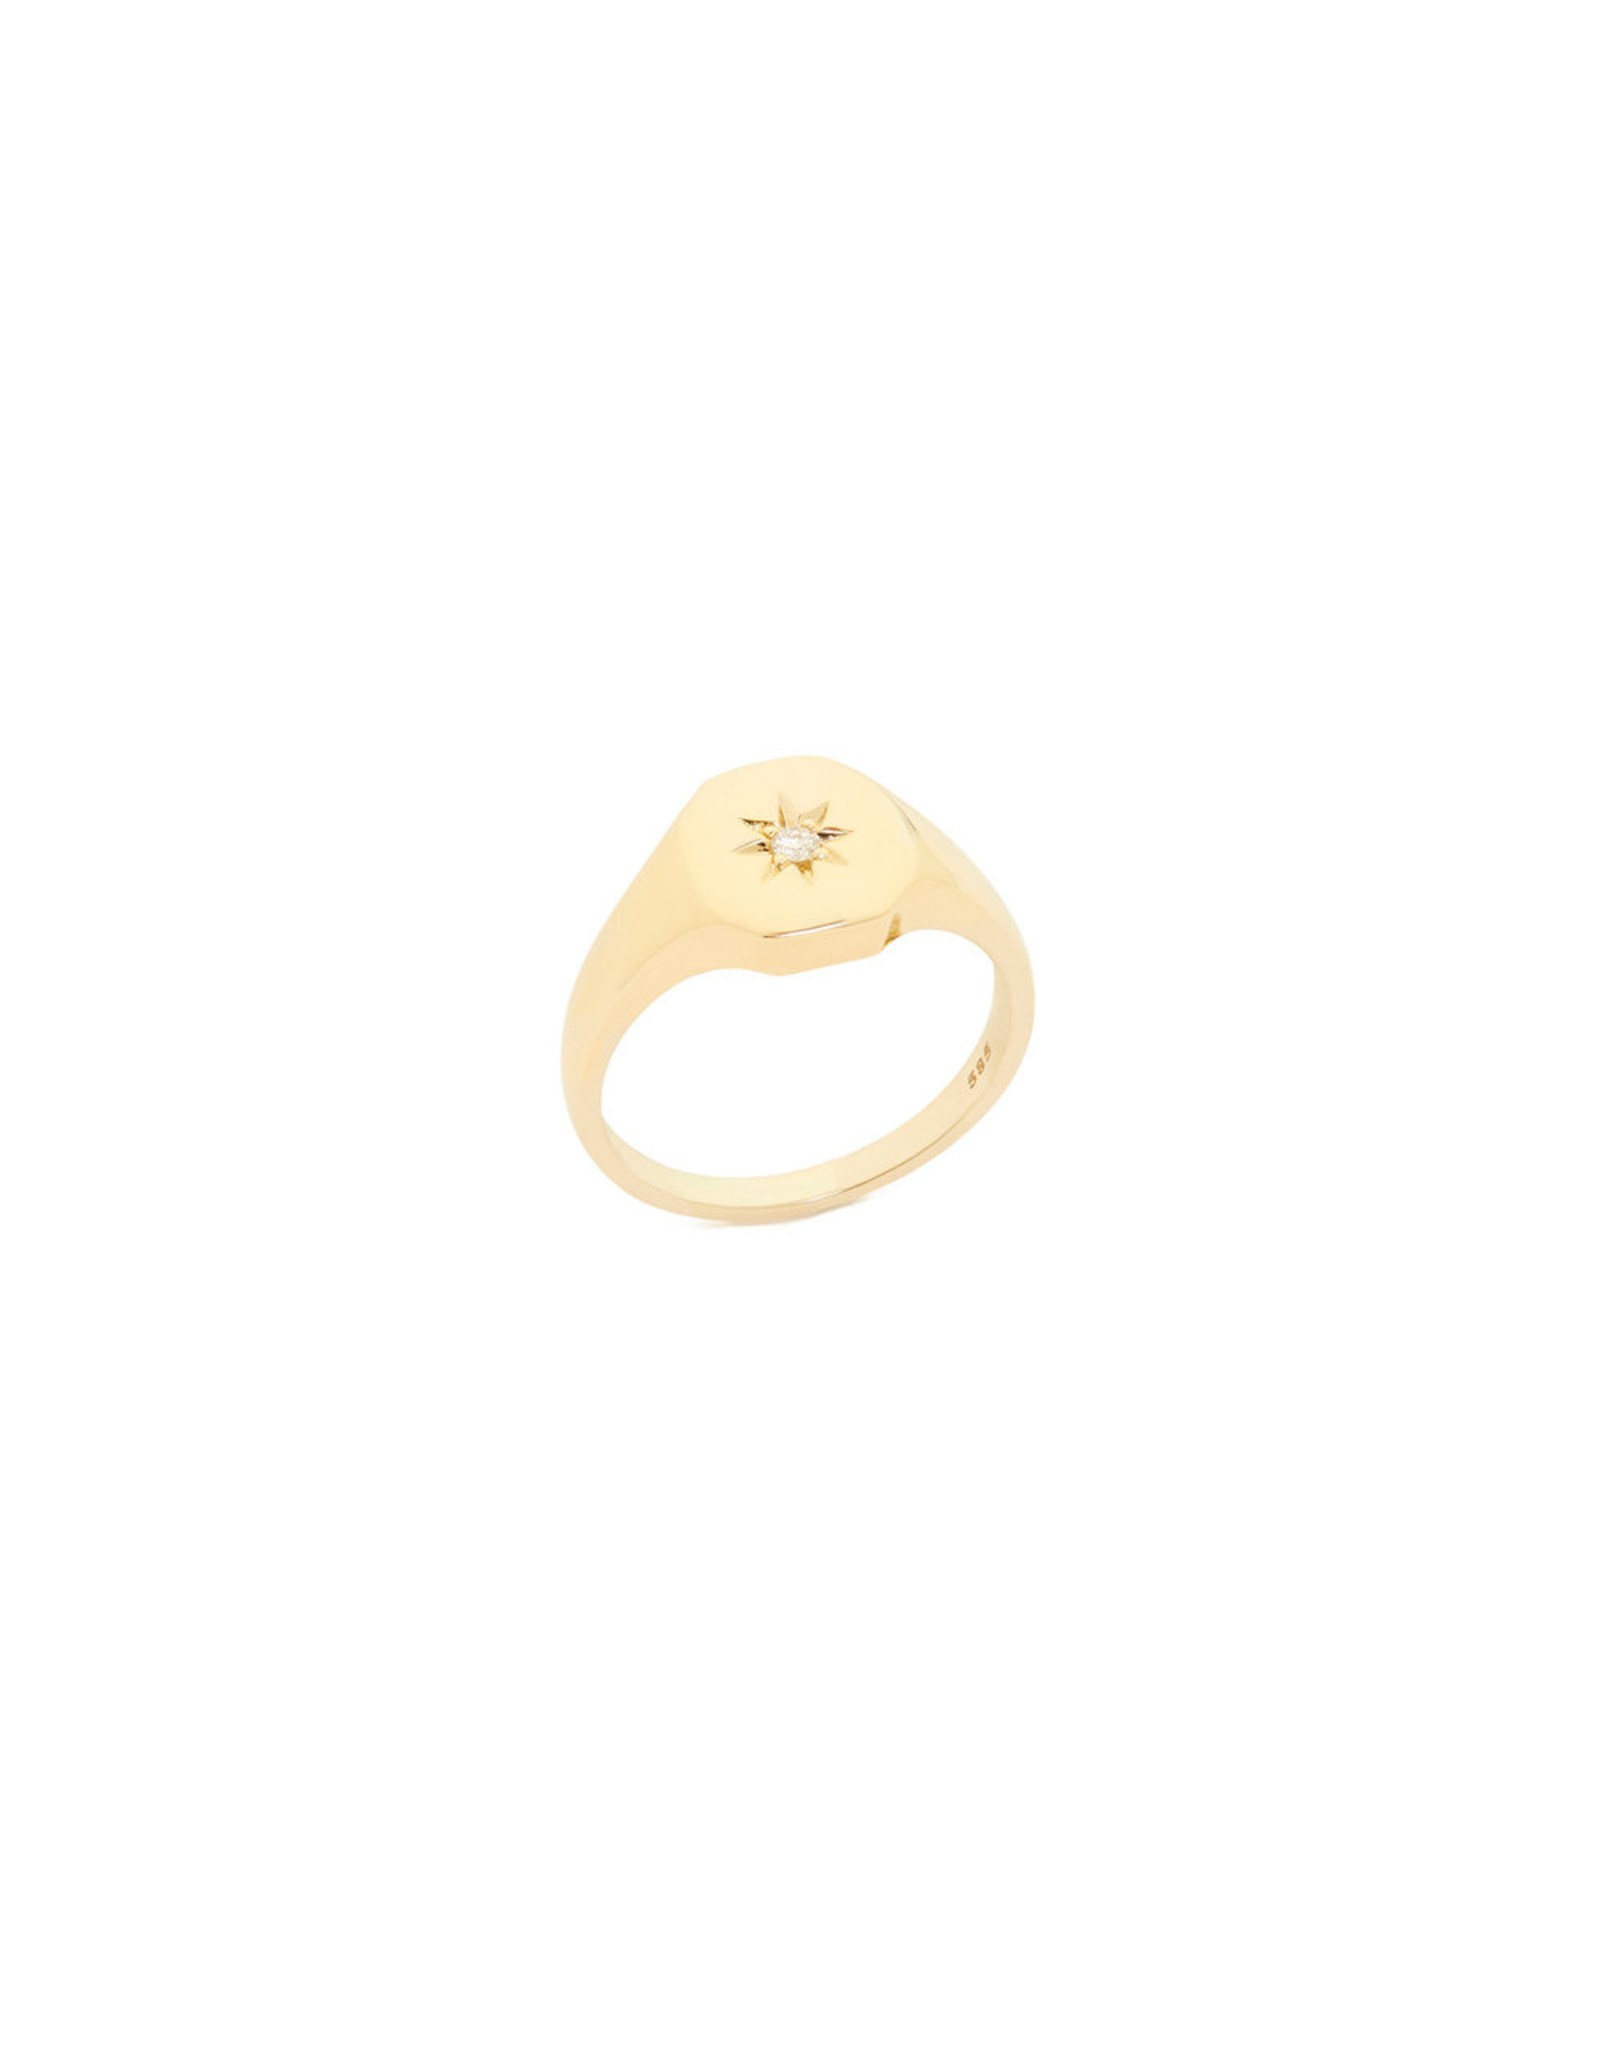 Bondeye Jewelry Bondeye Josie Yellow-Gold Signet Ring (Size: 6, Stone: Diamond)